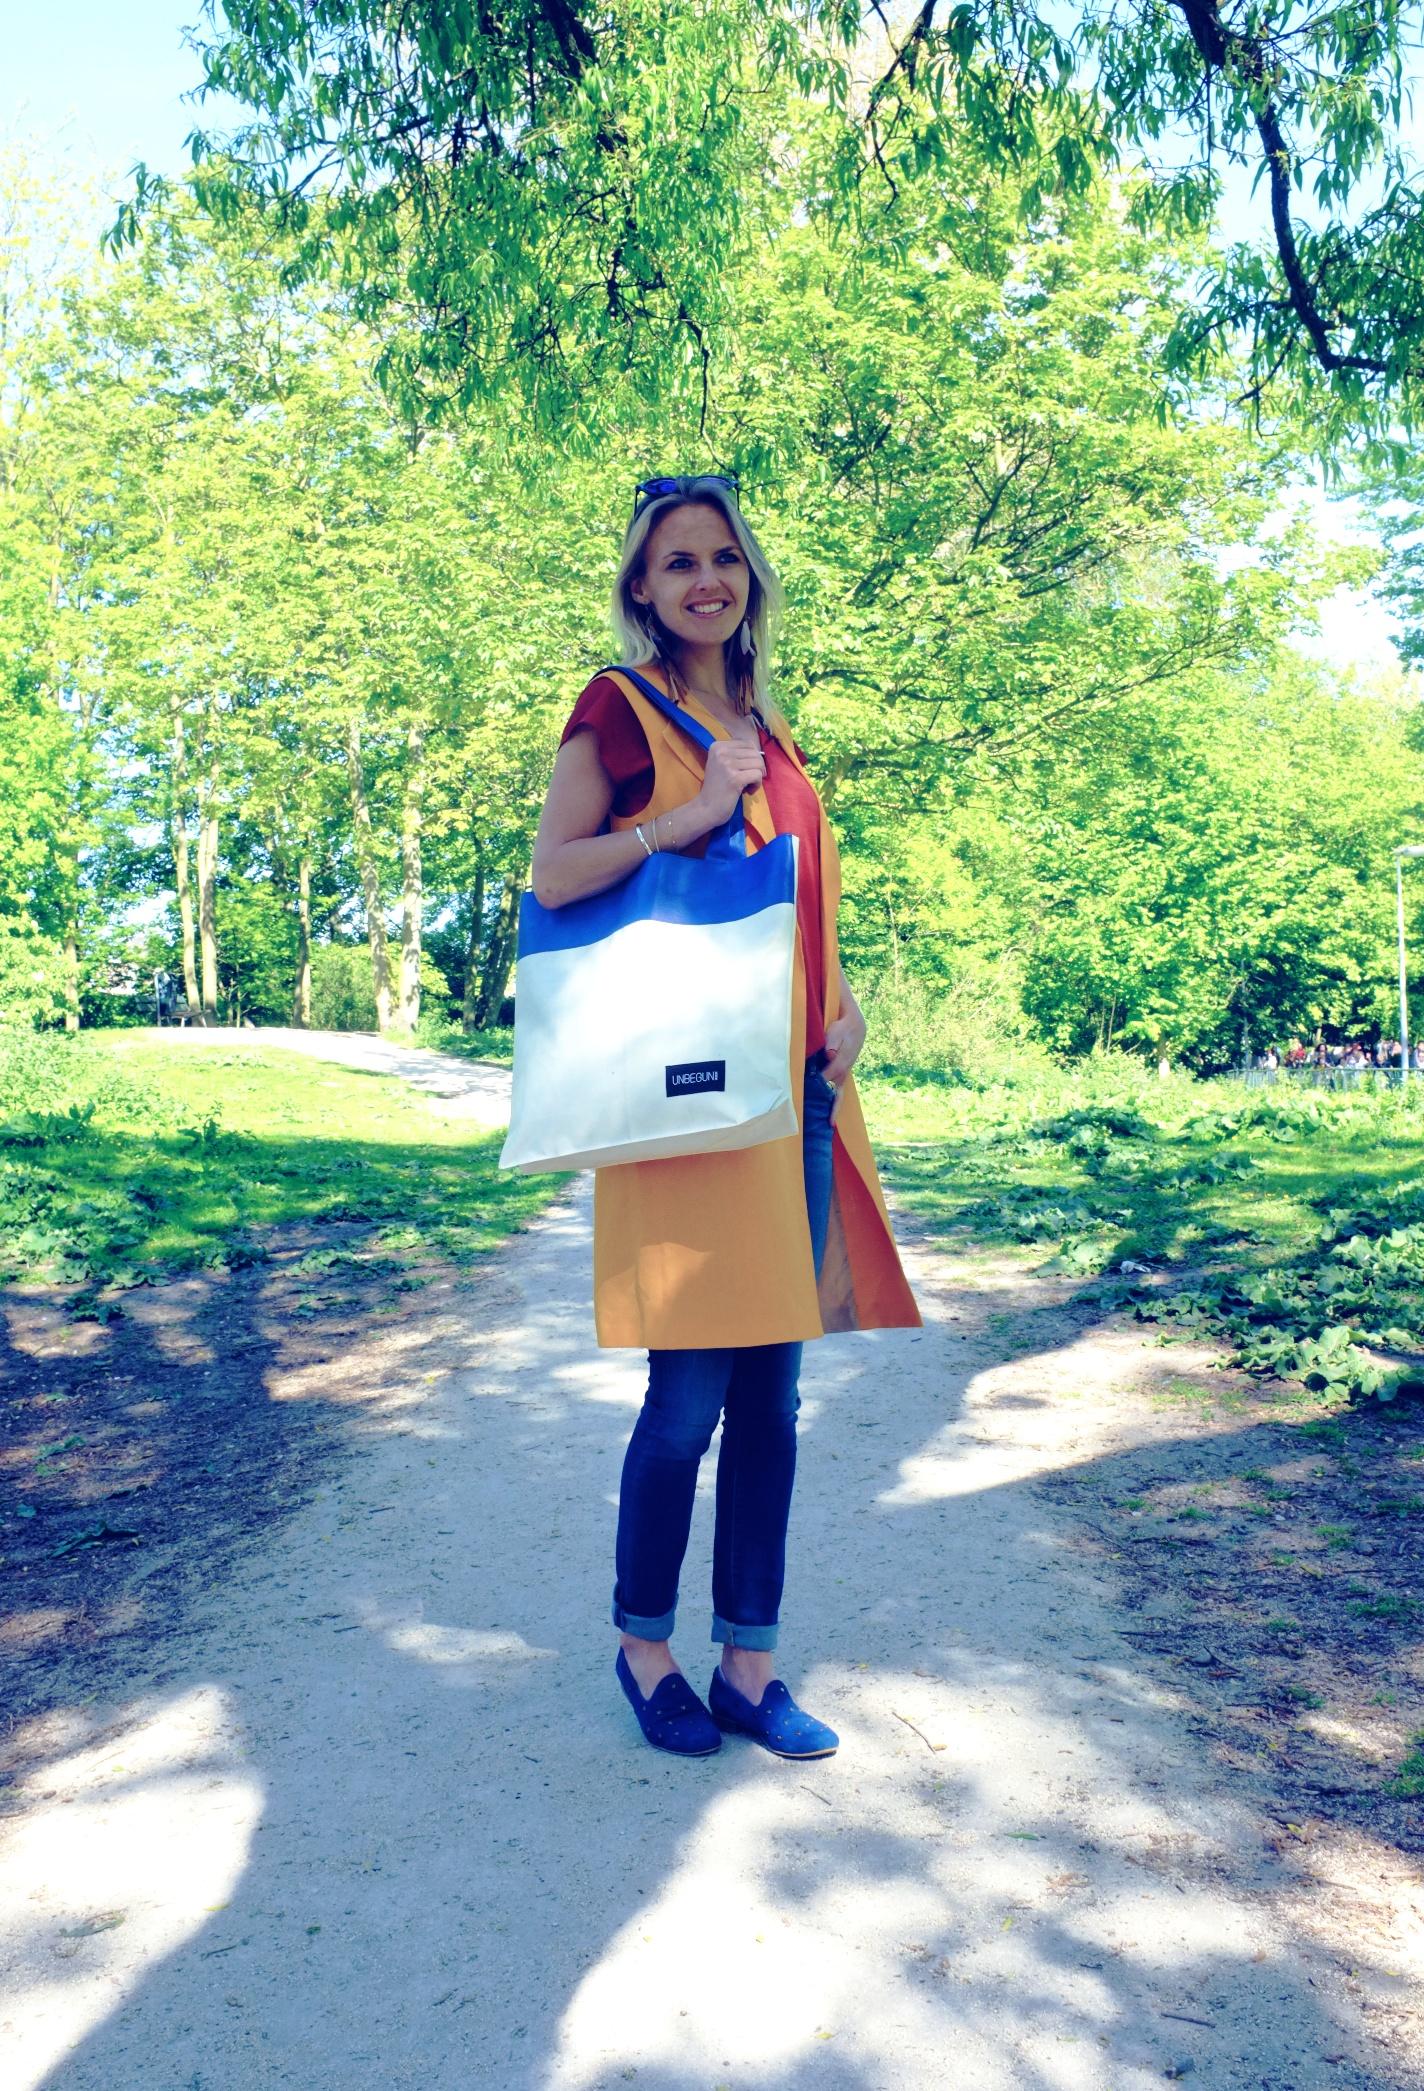 BagAtYou - Fashion Blog - Unbegun Bags - Tassen 6 - Jeans